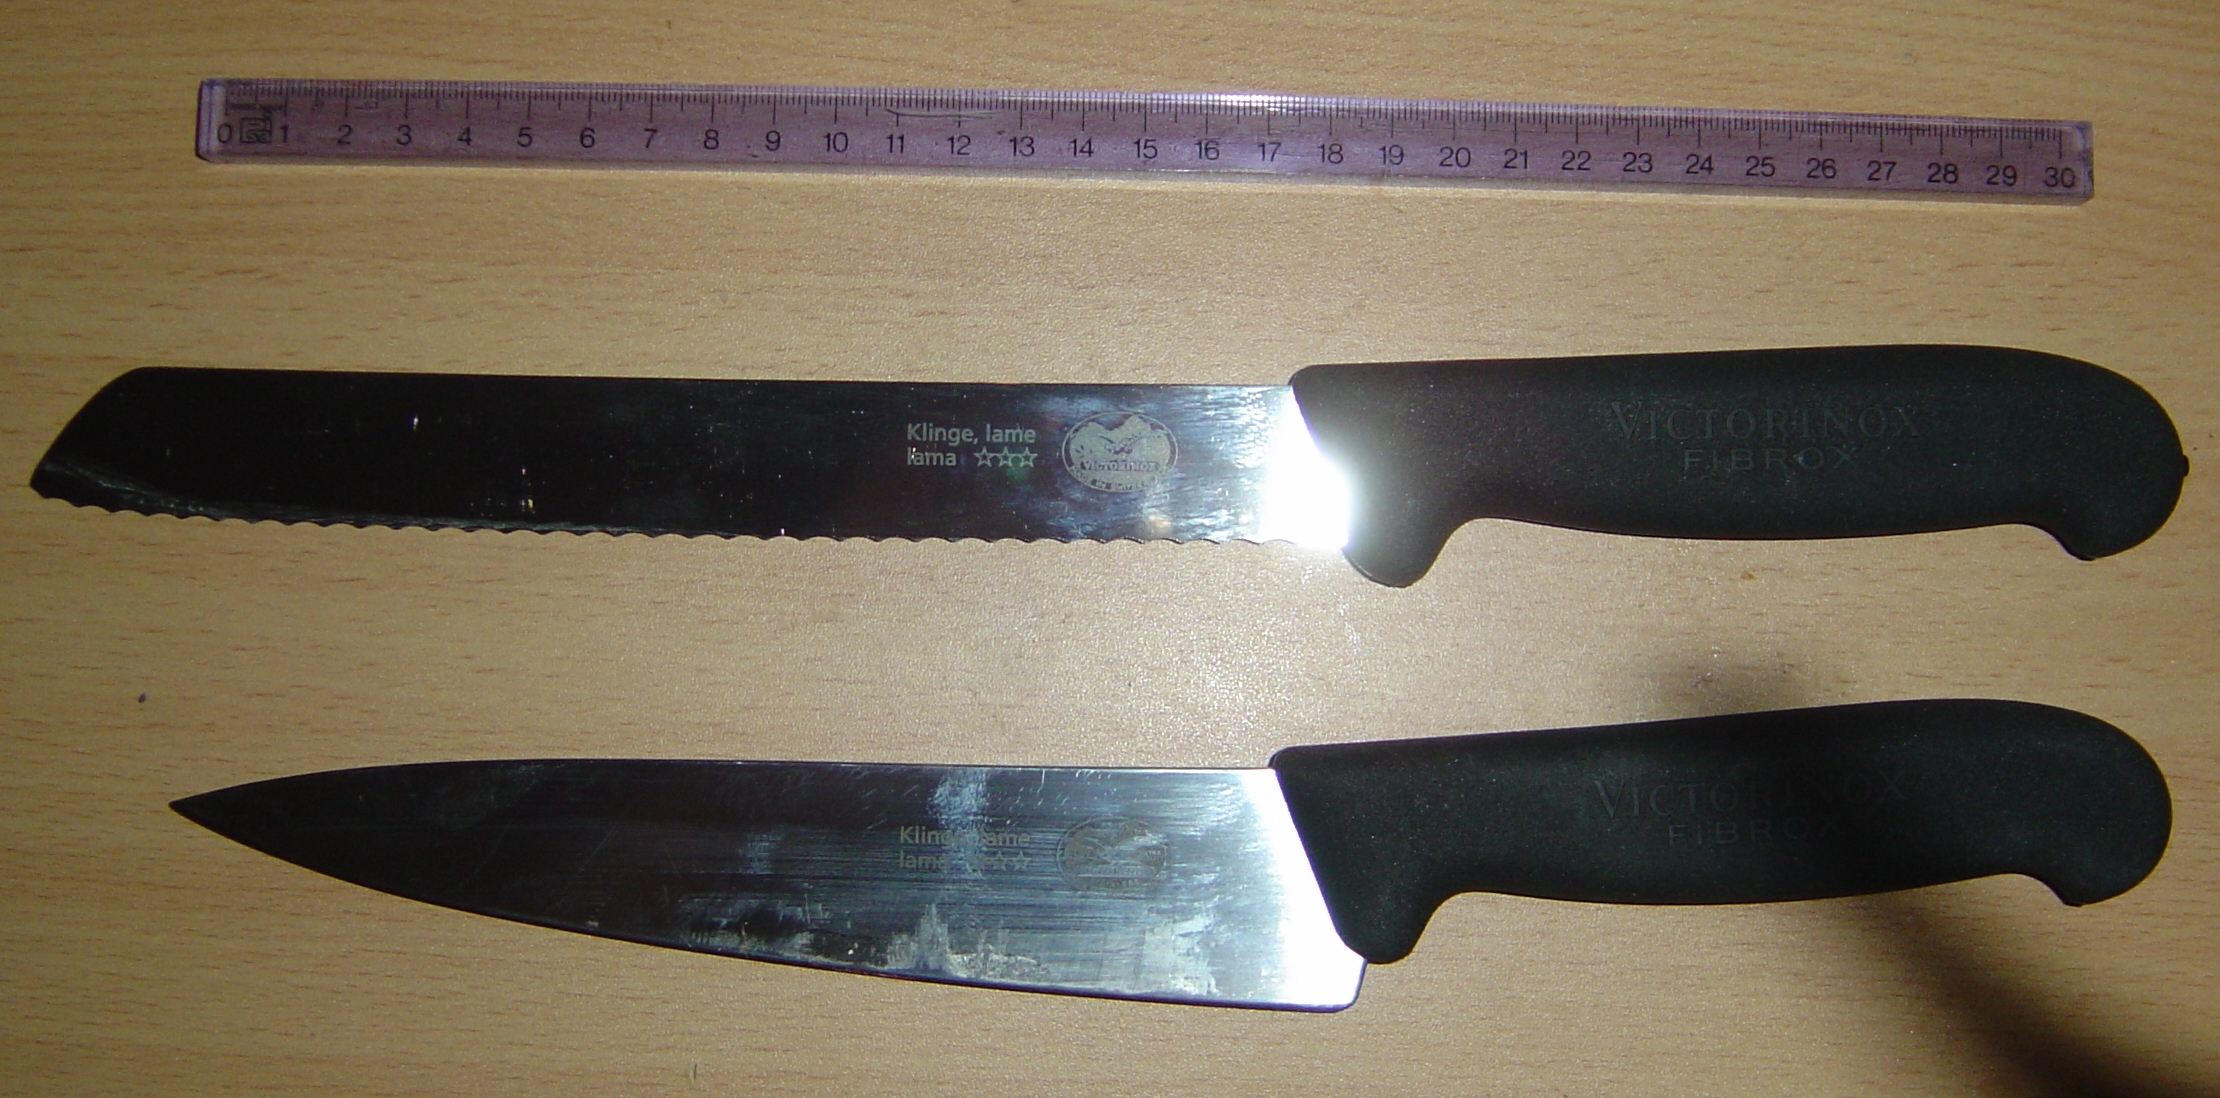 file victorinox bread and kitchen knives jpg wikipedia wiki knife upcscavenger